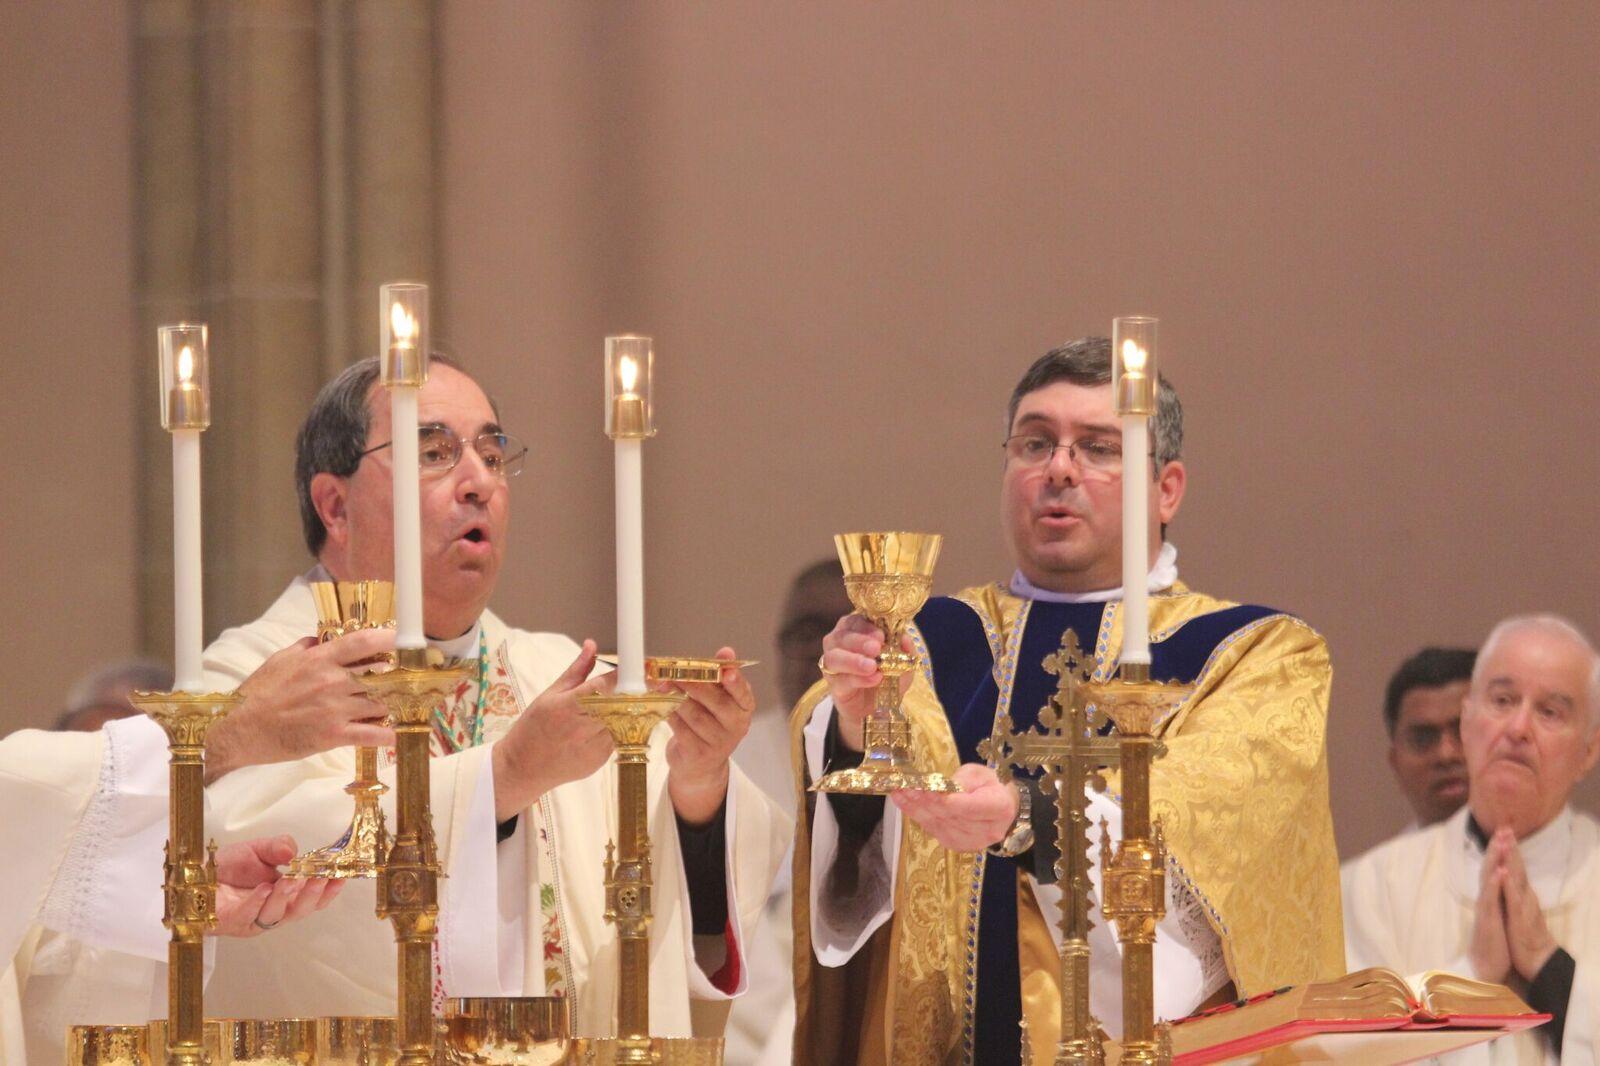 Diocese of shreveport